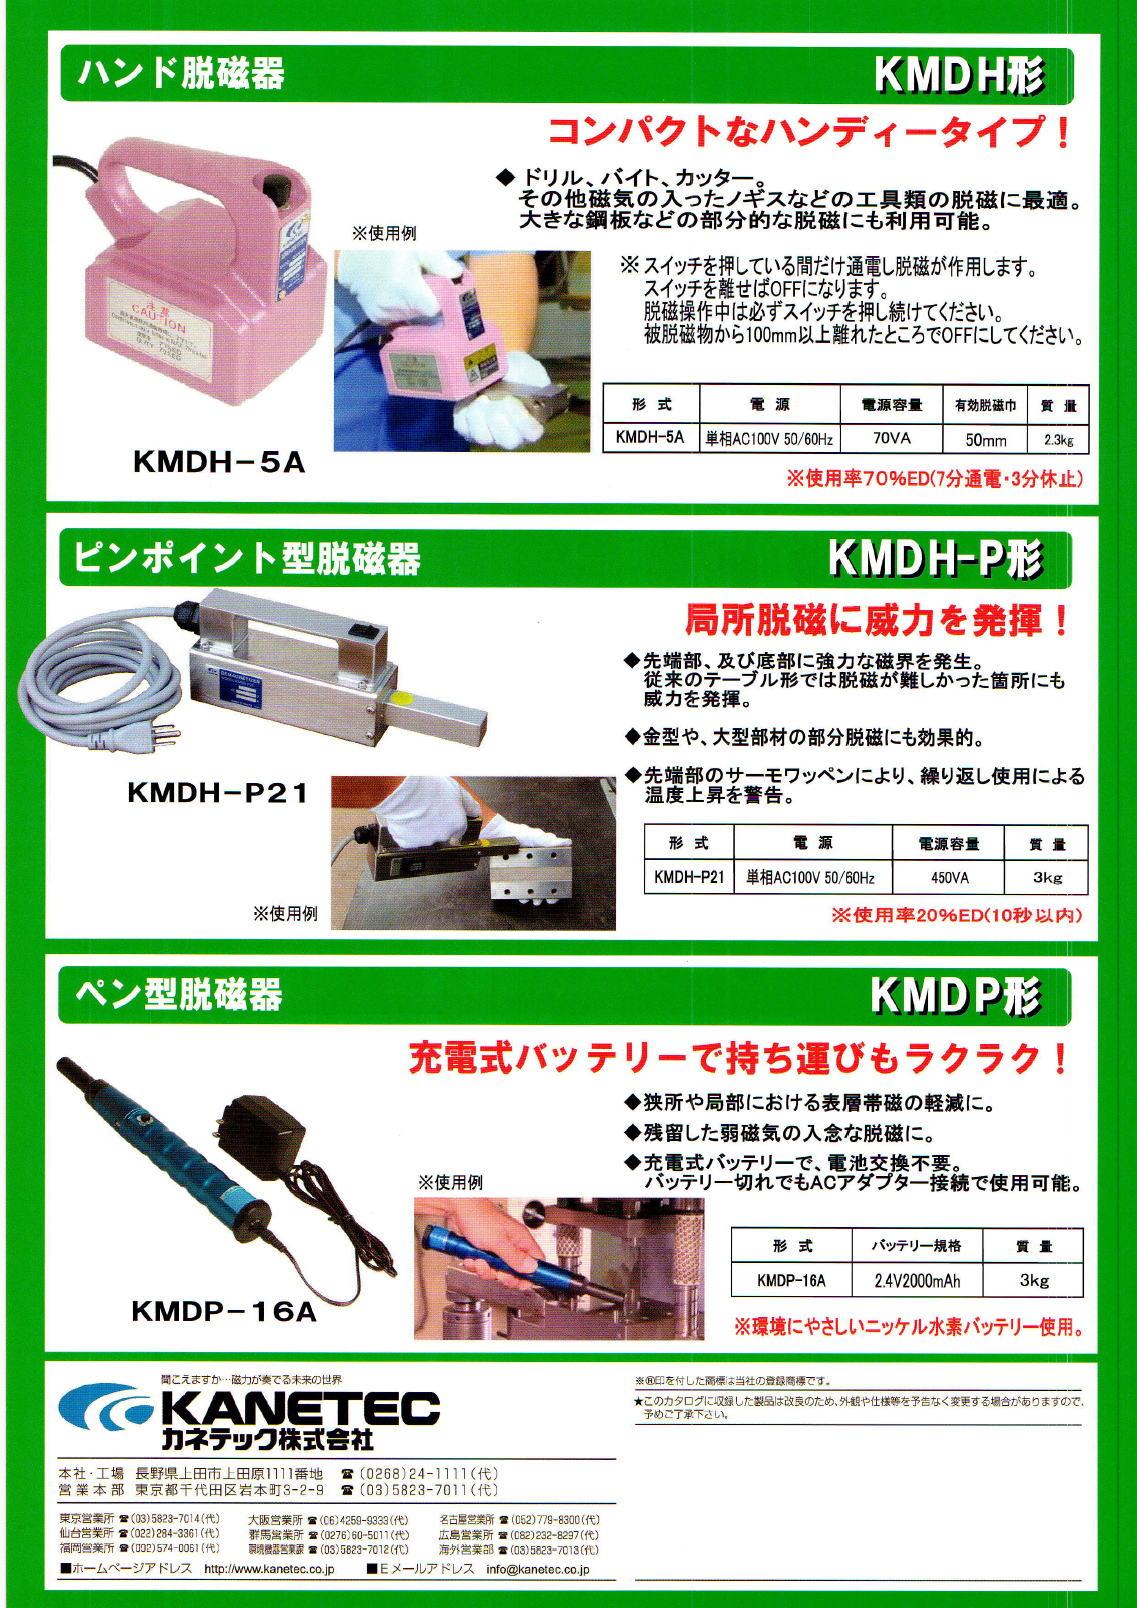 KANETEC カネテック コンデンサ式脱磁電源盤・専用脱磁コイル ベアリングなど、脱磁が困難だったワークに! KMDH-5A / KMDH-P21 / KMDP-16A